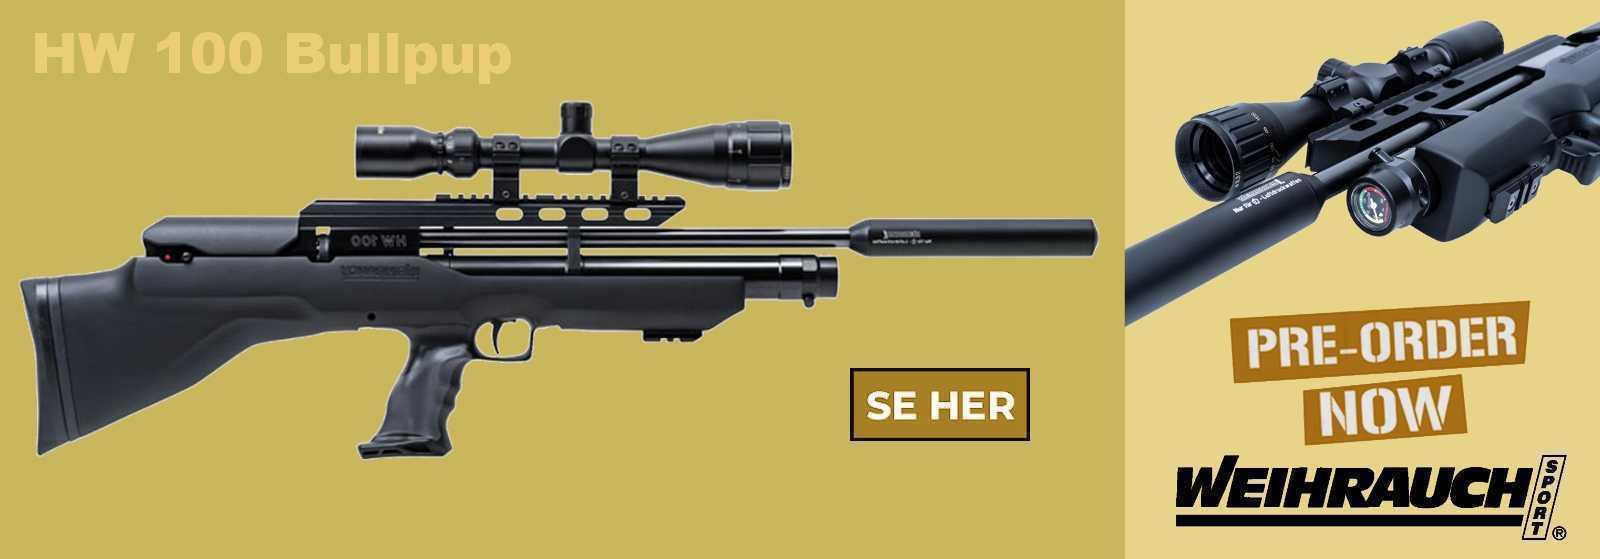 Weihrauch HW 100 Bullpup PCP luftgevær